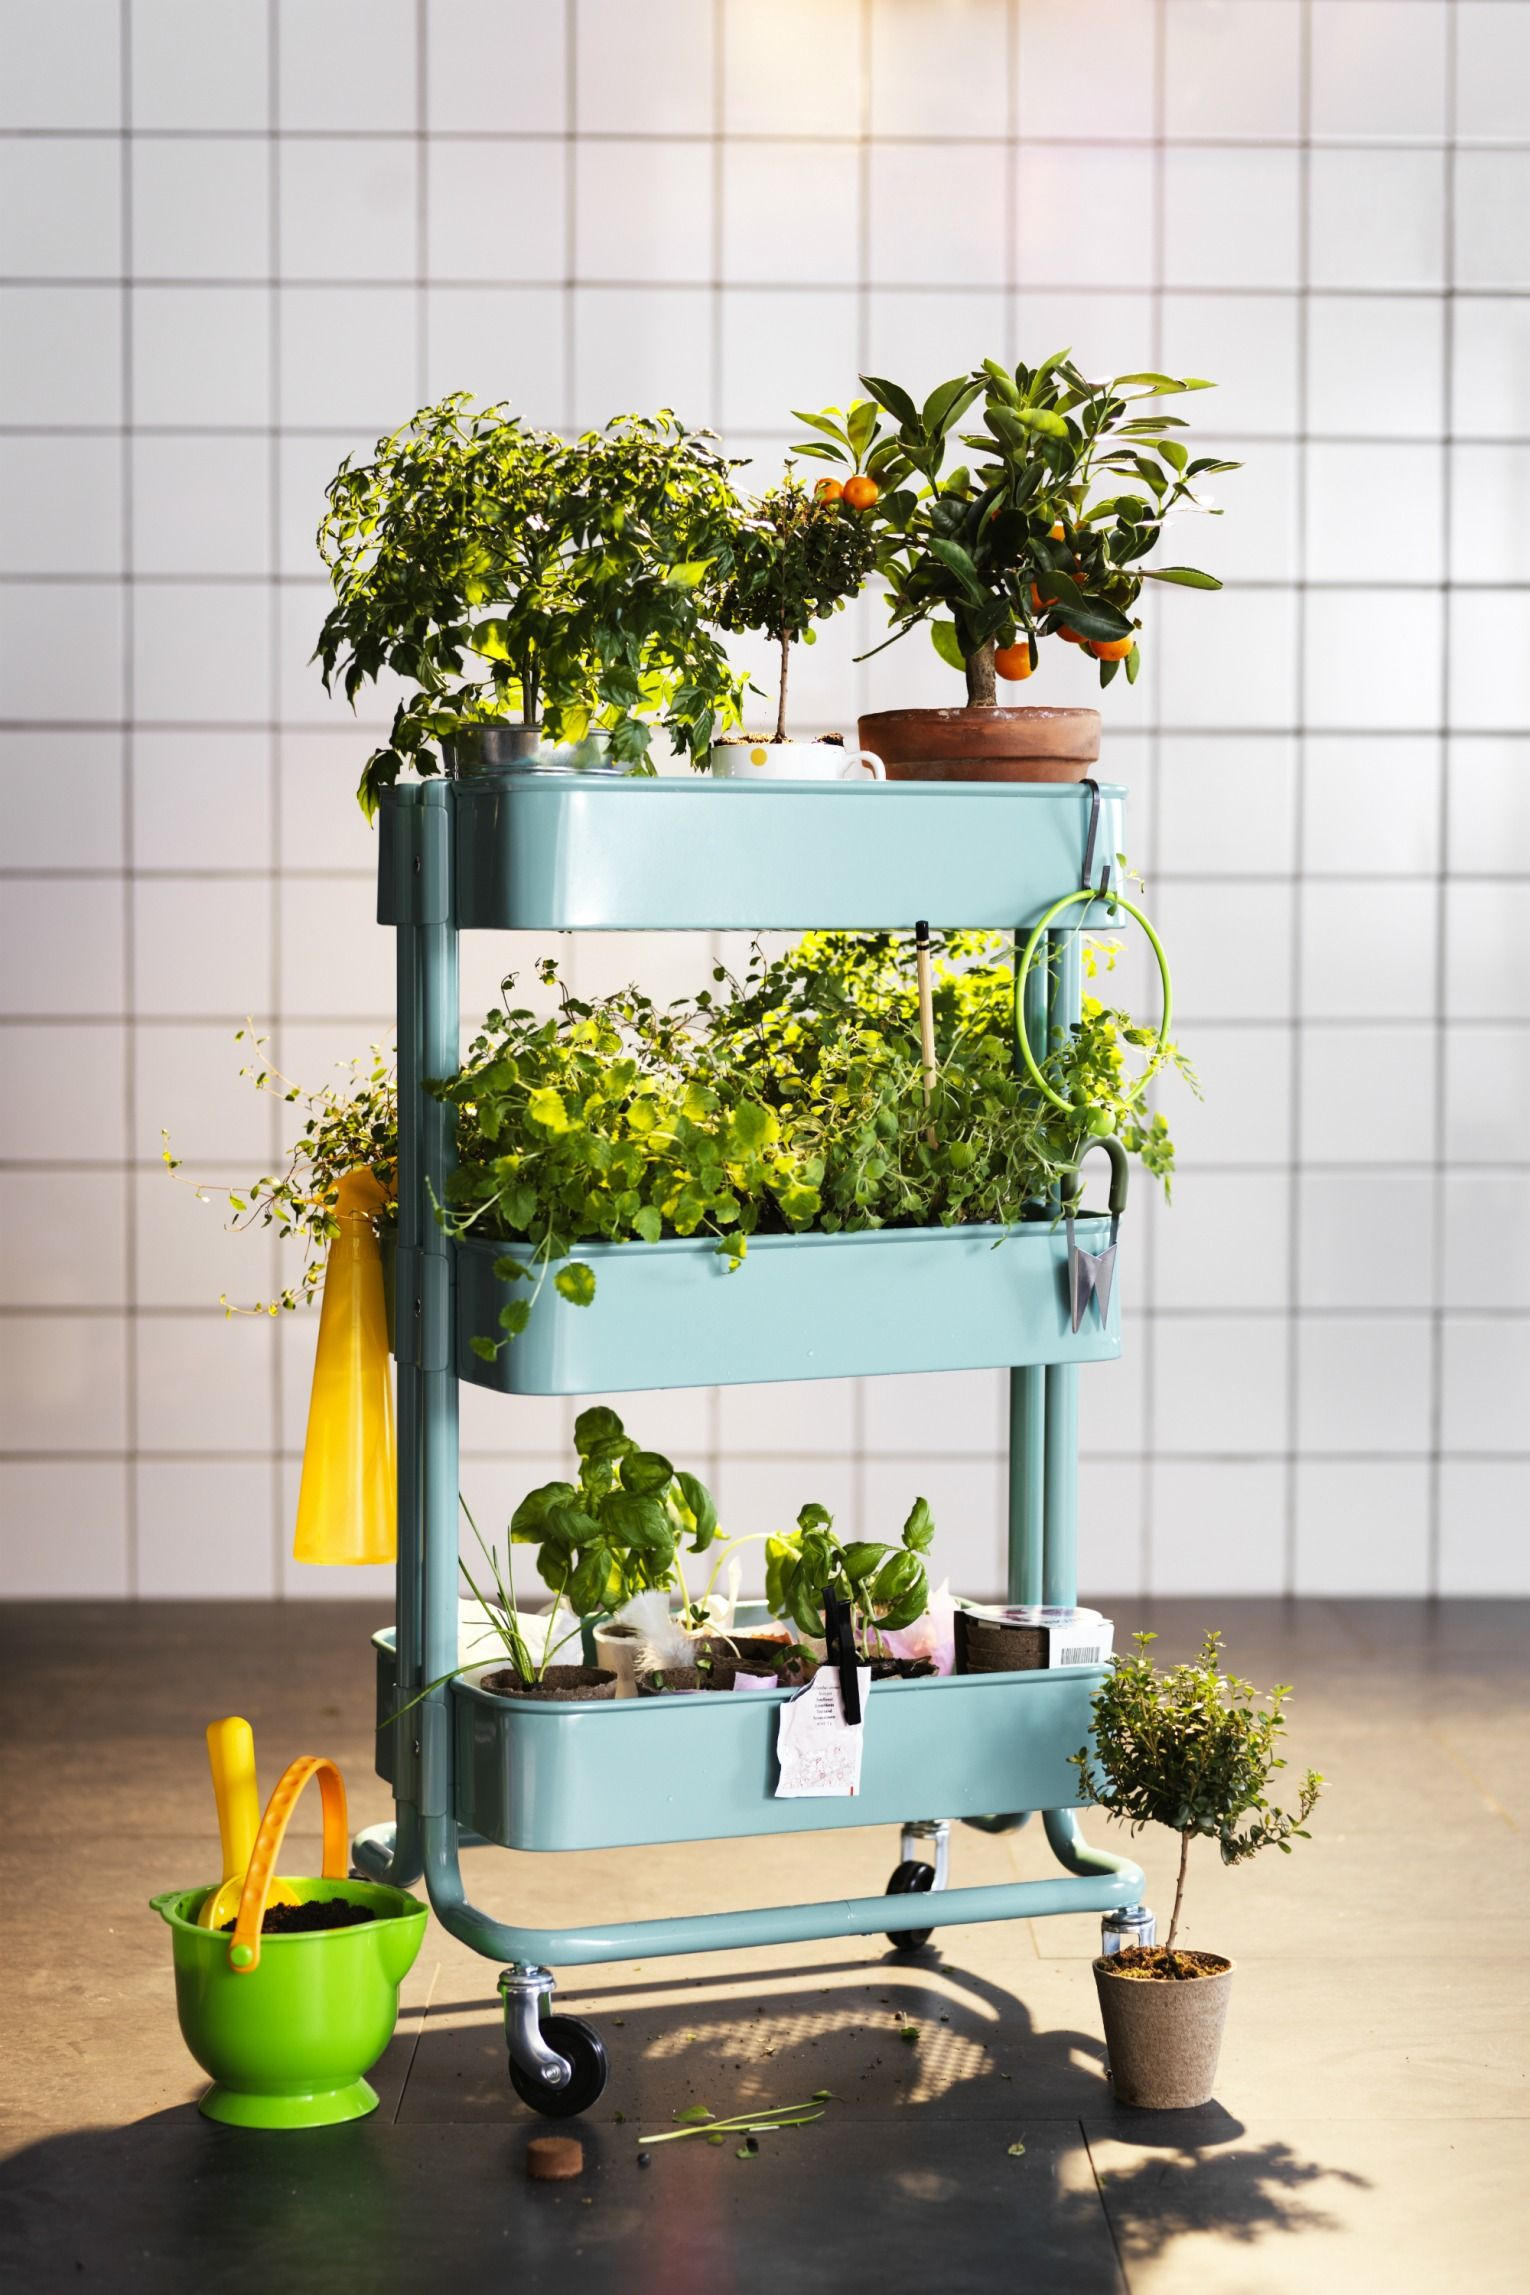 Ikea Us Furniture And Home Furnishings Indoor Herb Garden Backyard Garden Design Backyard Garden